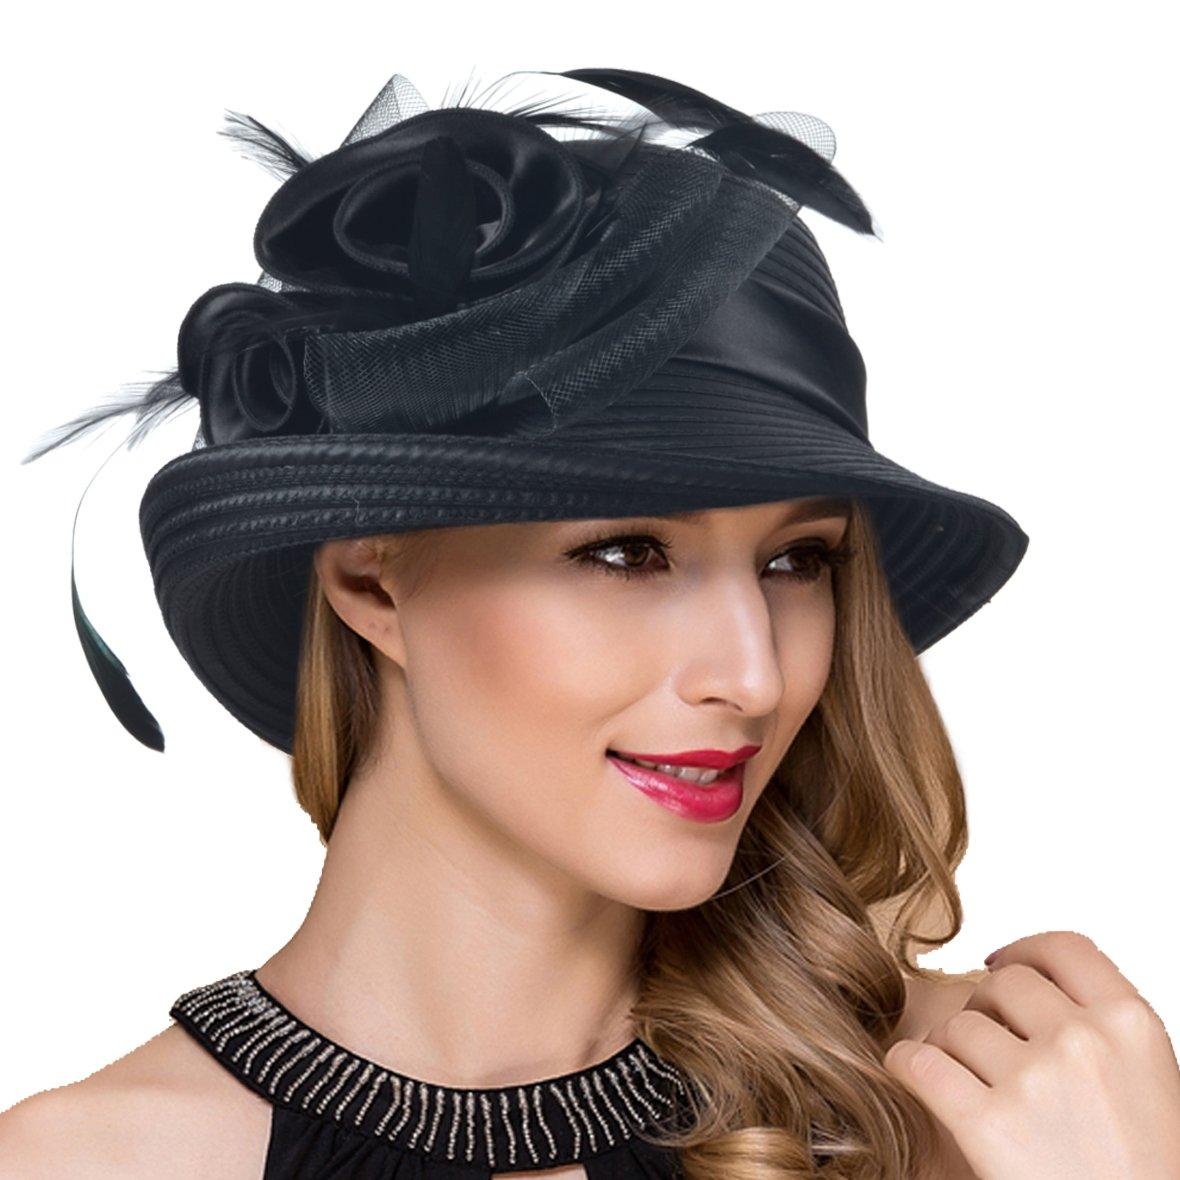 Women Kentucky Derby Church Dress Cloche Hat Fascinator Floral Bucket Hat S052 (S608-Black)